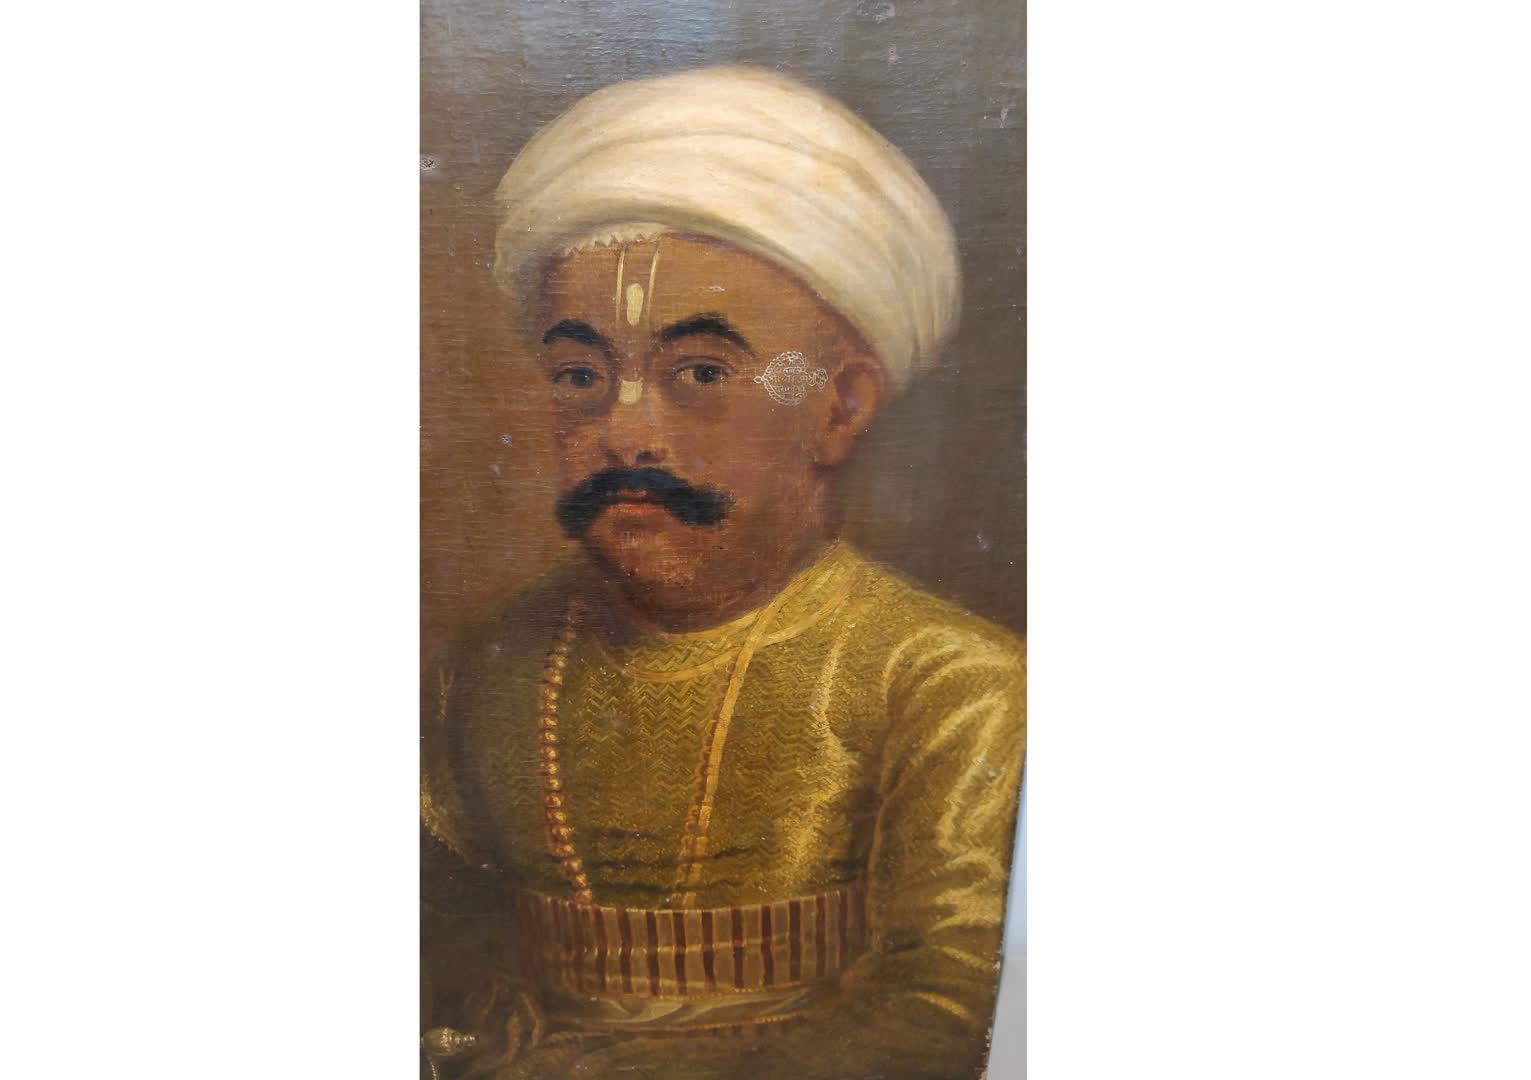 Mahadji Shinde | Directorate of Archaeology and Museums, Govt of Maharashtra